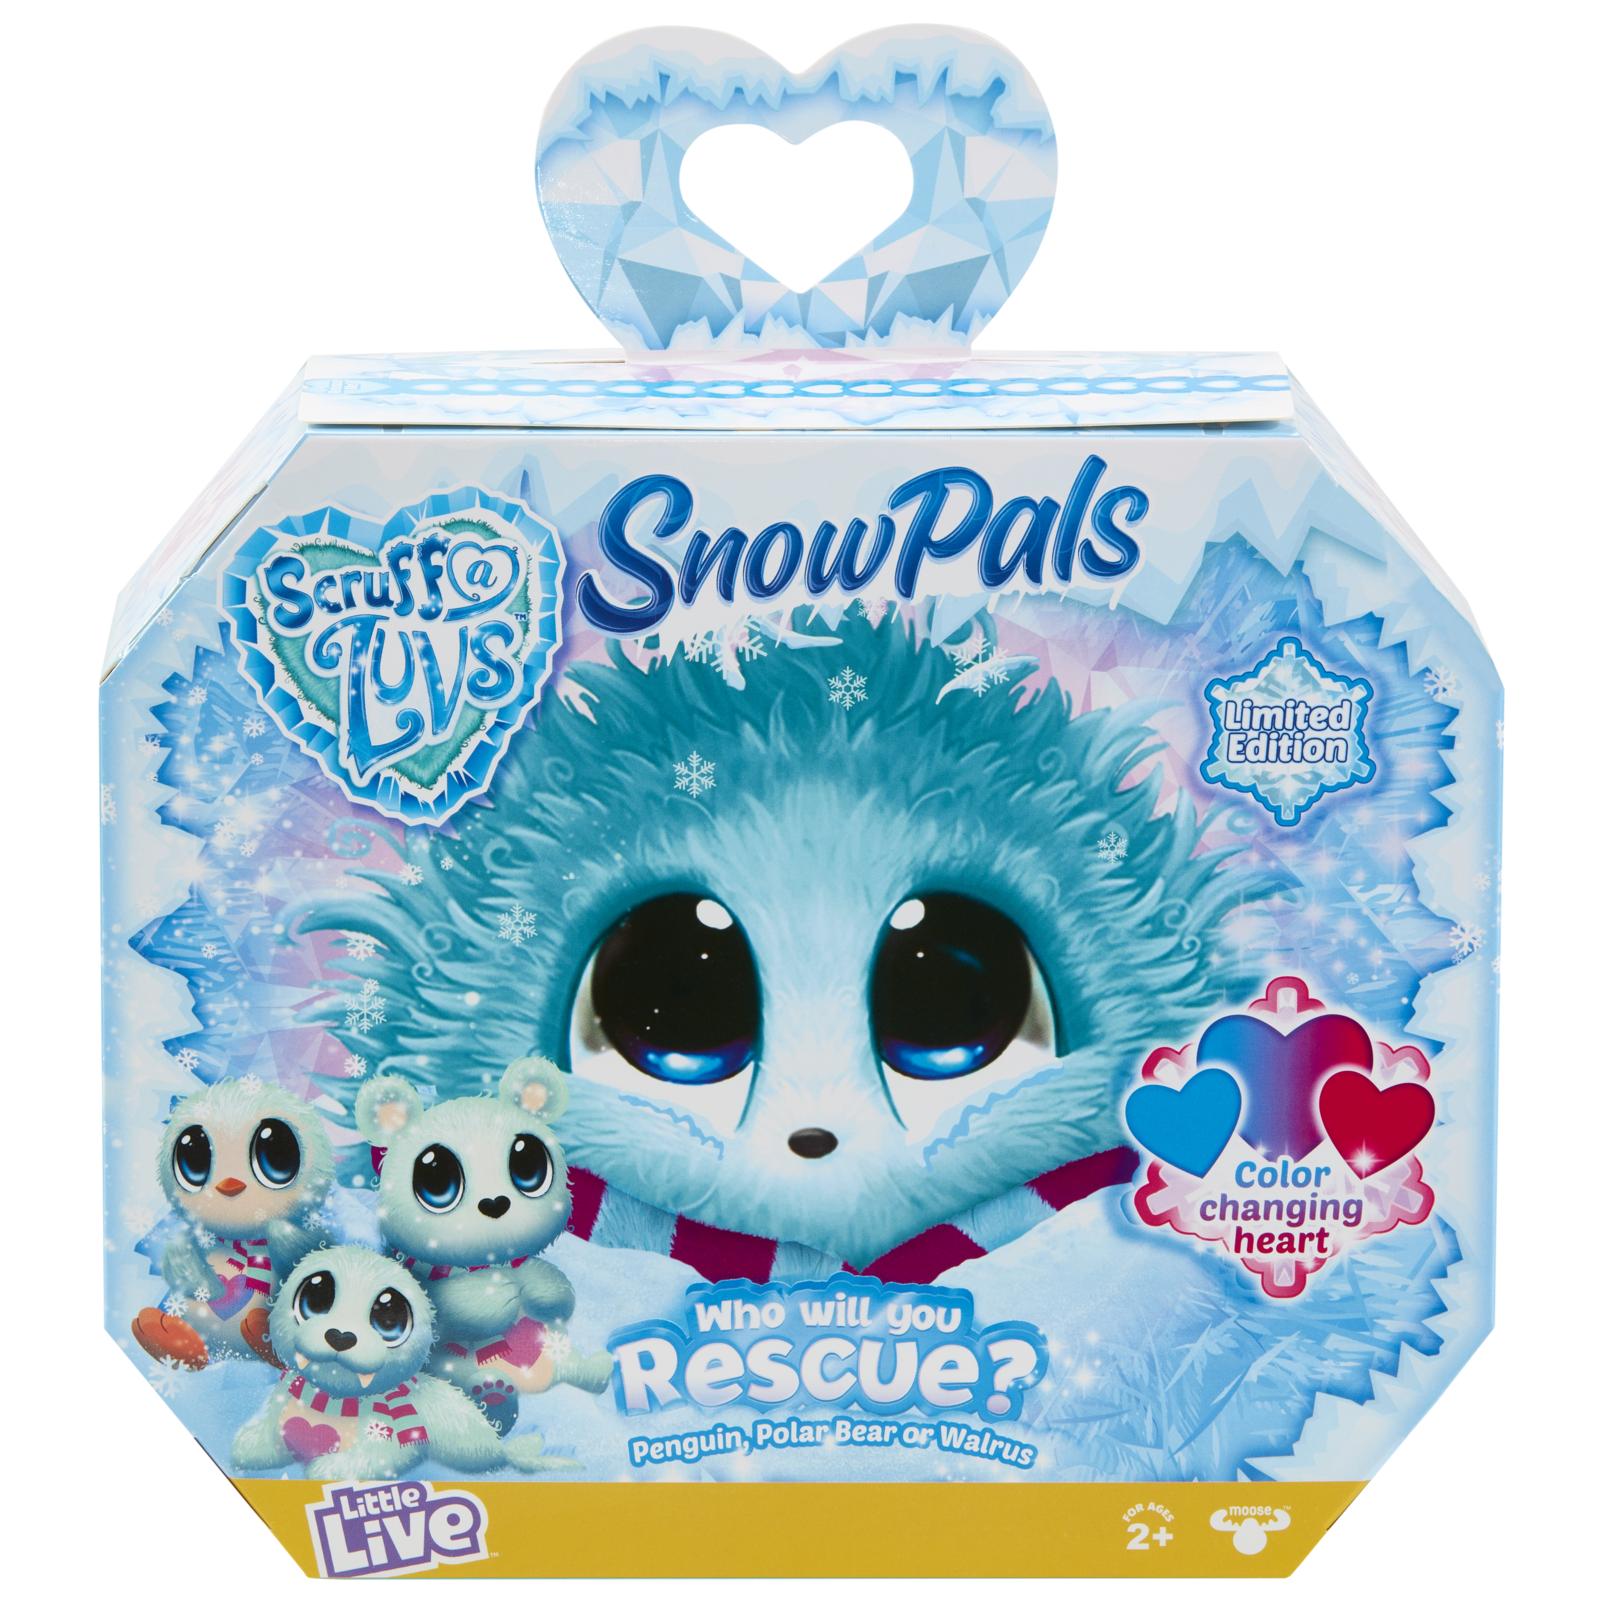 Scruff-a-Luvs: Surprise Plush - Snow Pals image